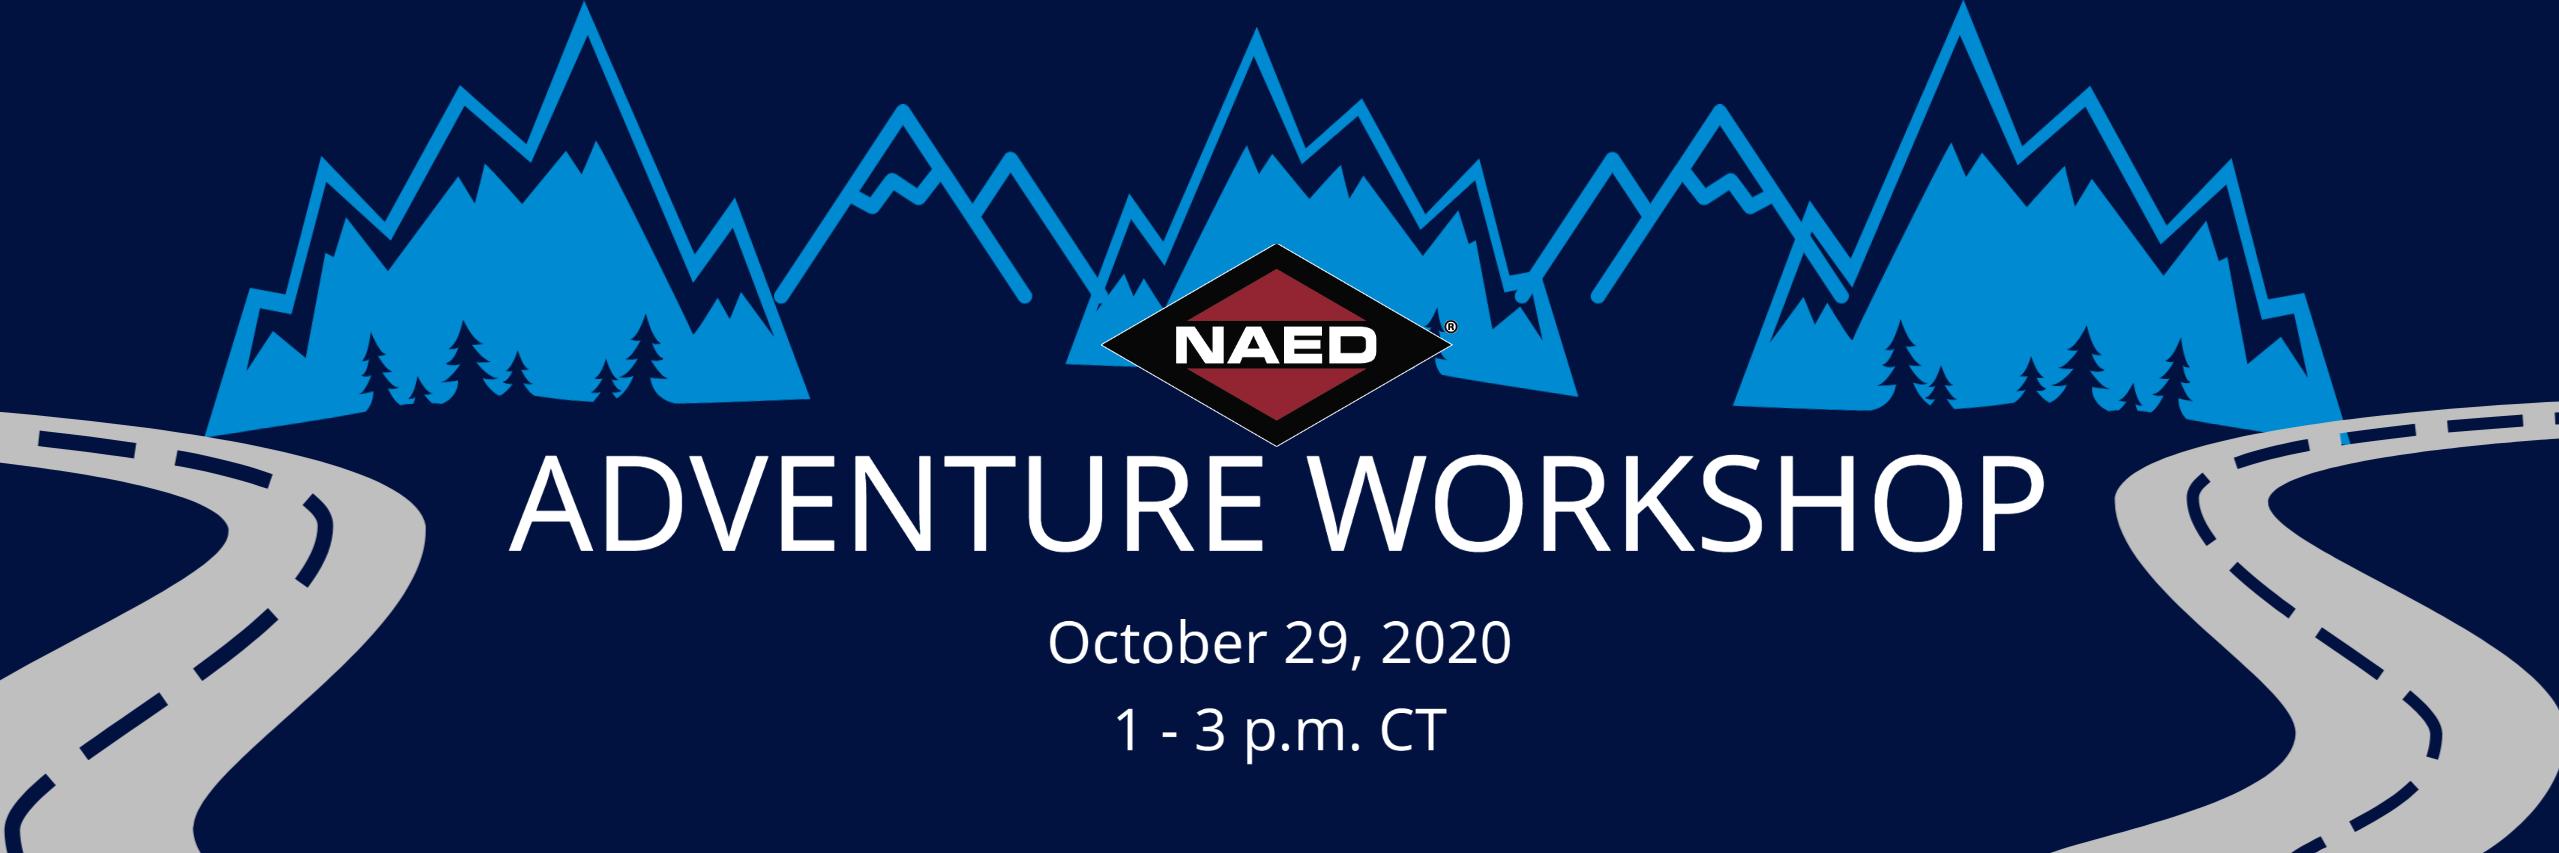 2020 Adventure Workshop to Focus on Customer Needs